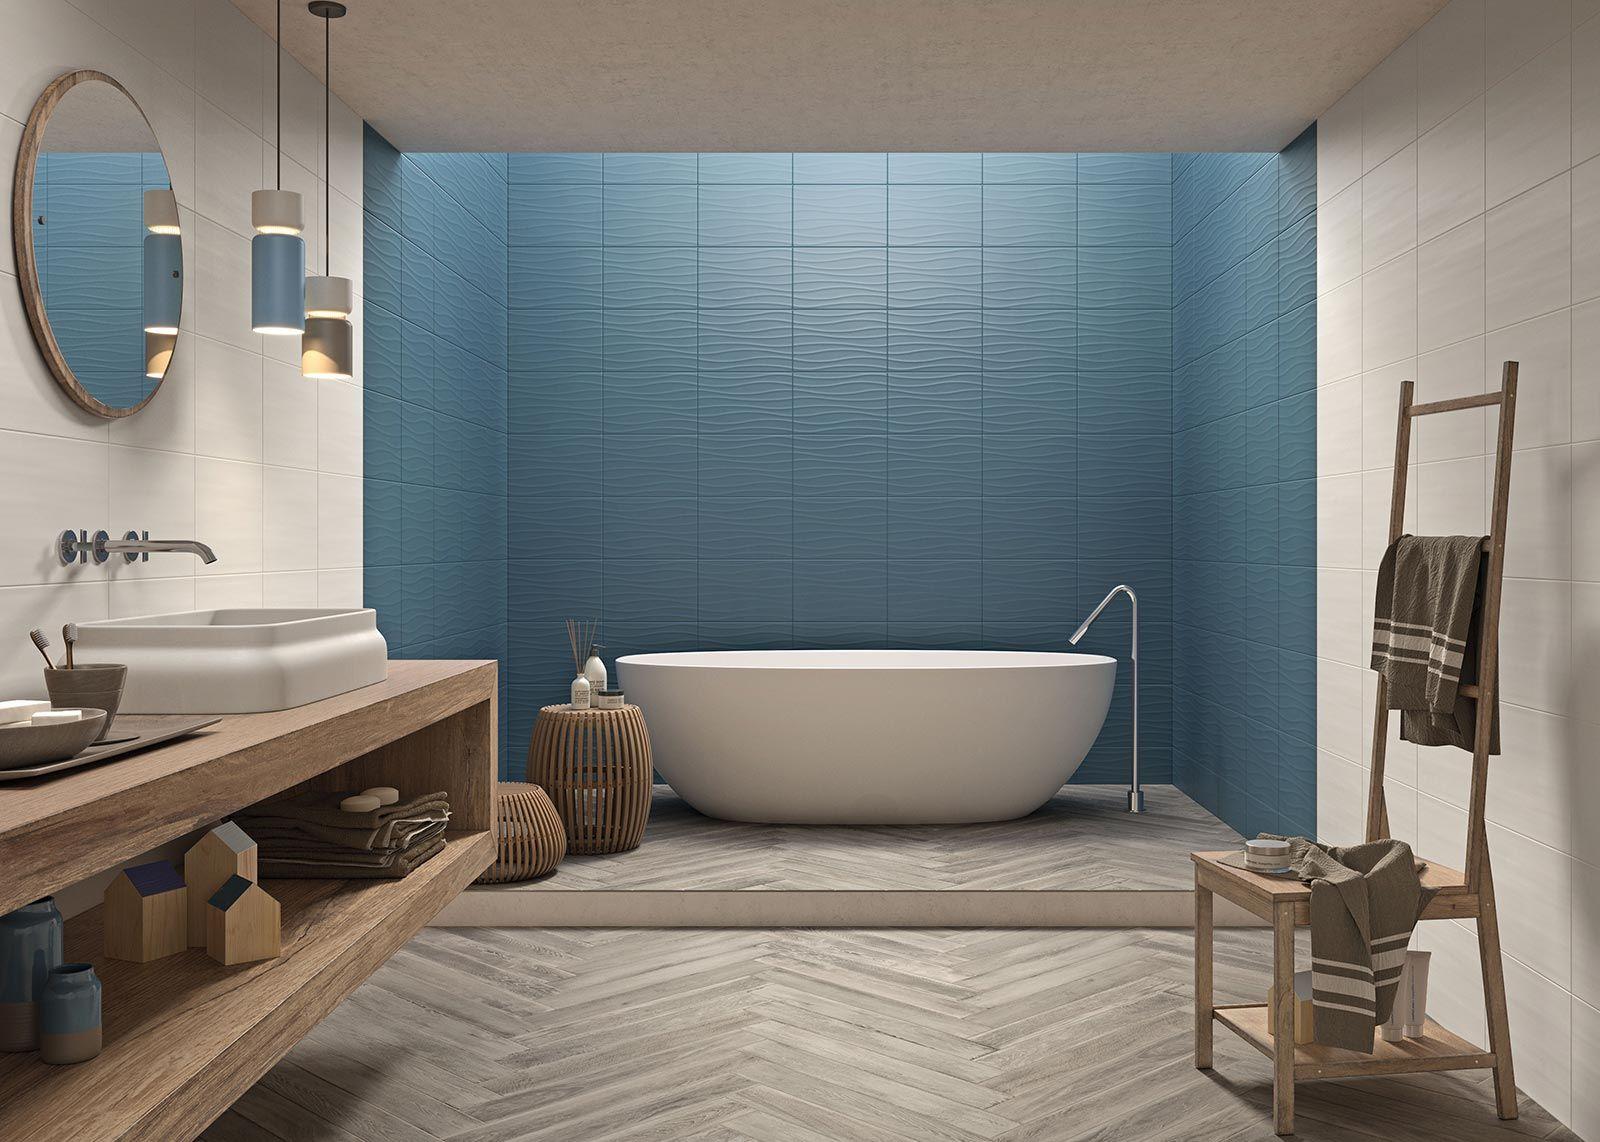 Neutral Marazzi Bathroom Decoration Walltiles Ceramics Blue Woodtiles Blue Bathroom Tile Blue Shower Tile Easy Bathroom Decorating